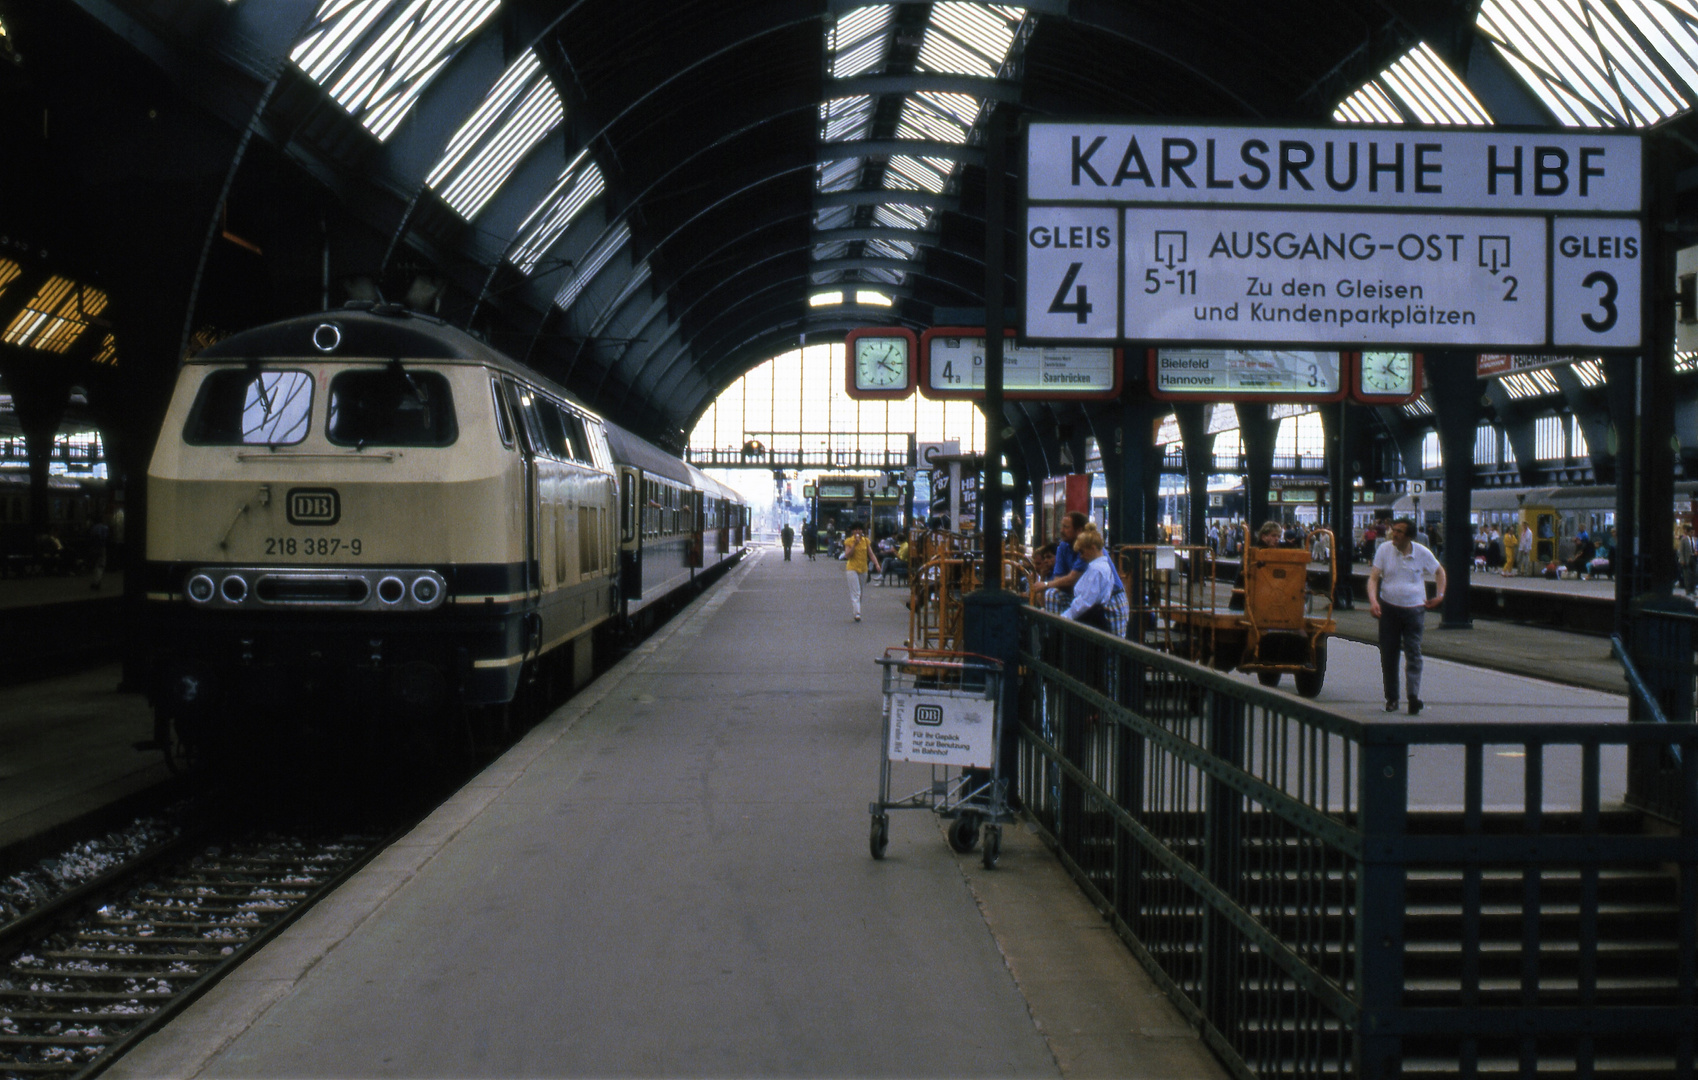 Brückensperrung Karlsruhe